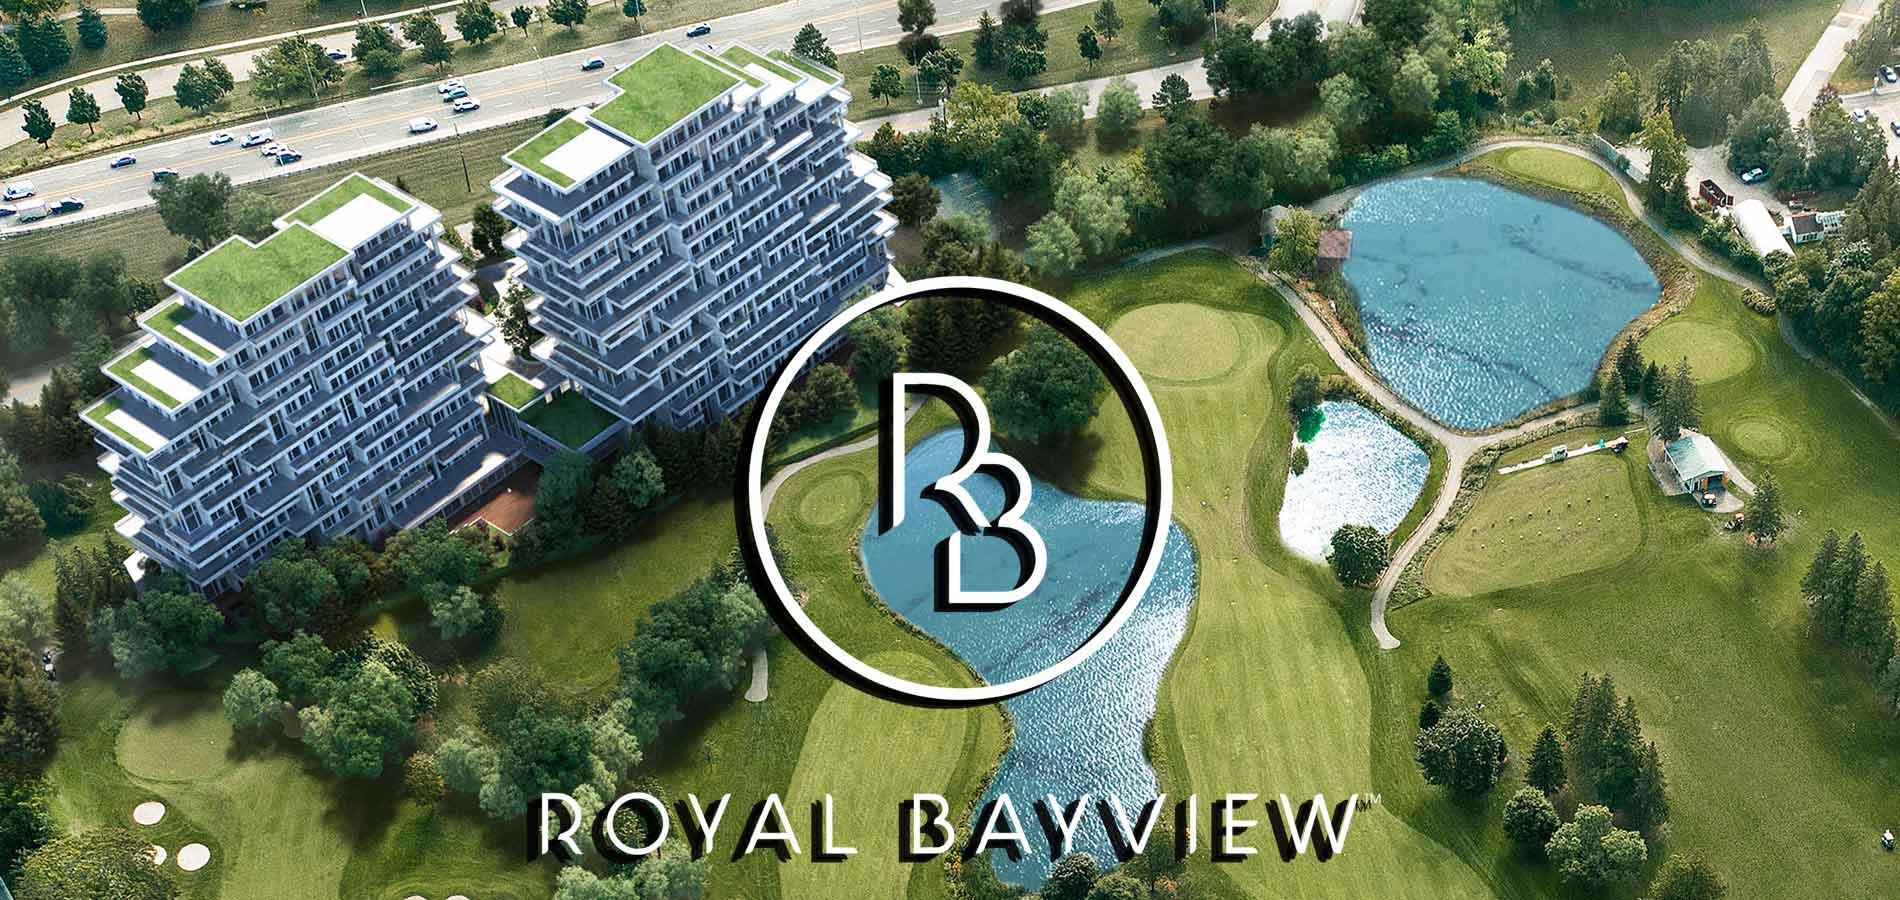 Royal Bayview luxury condos Thornhill